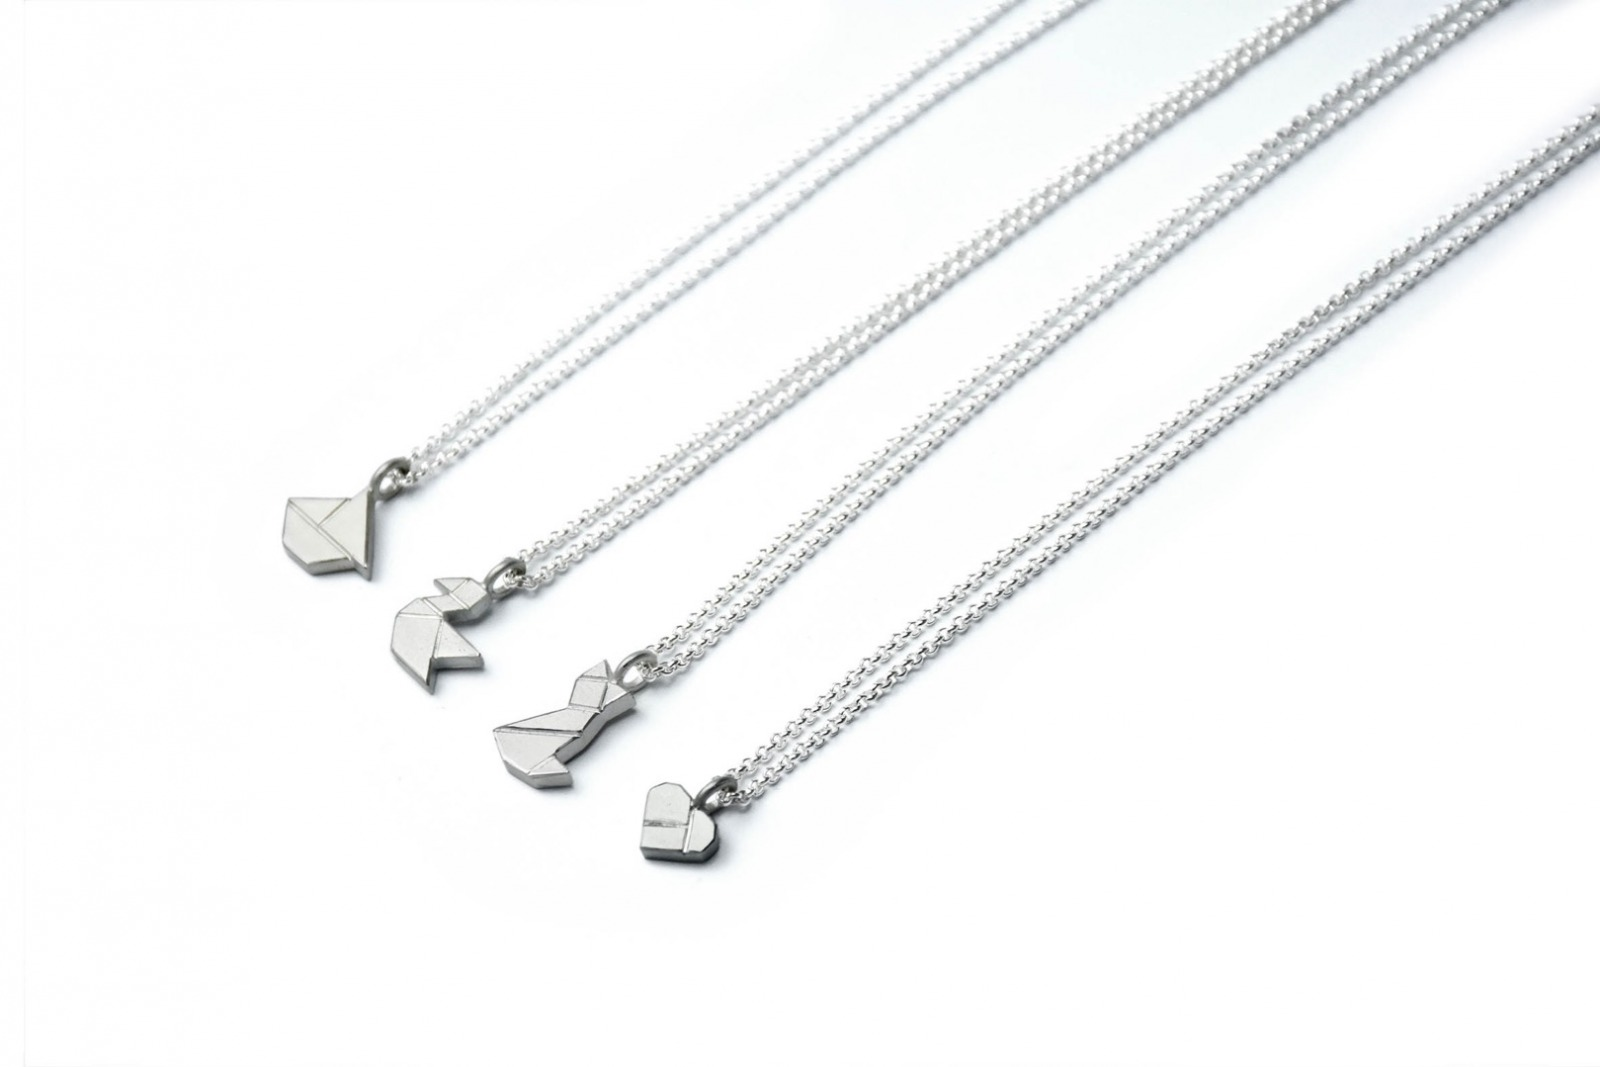 Tangram Kette MIEZE 935 Silber 5